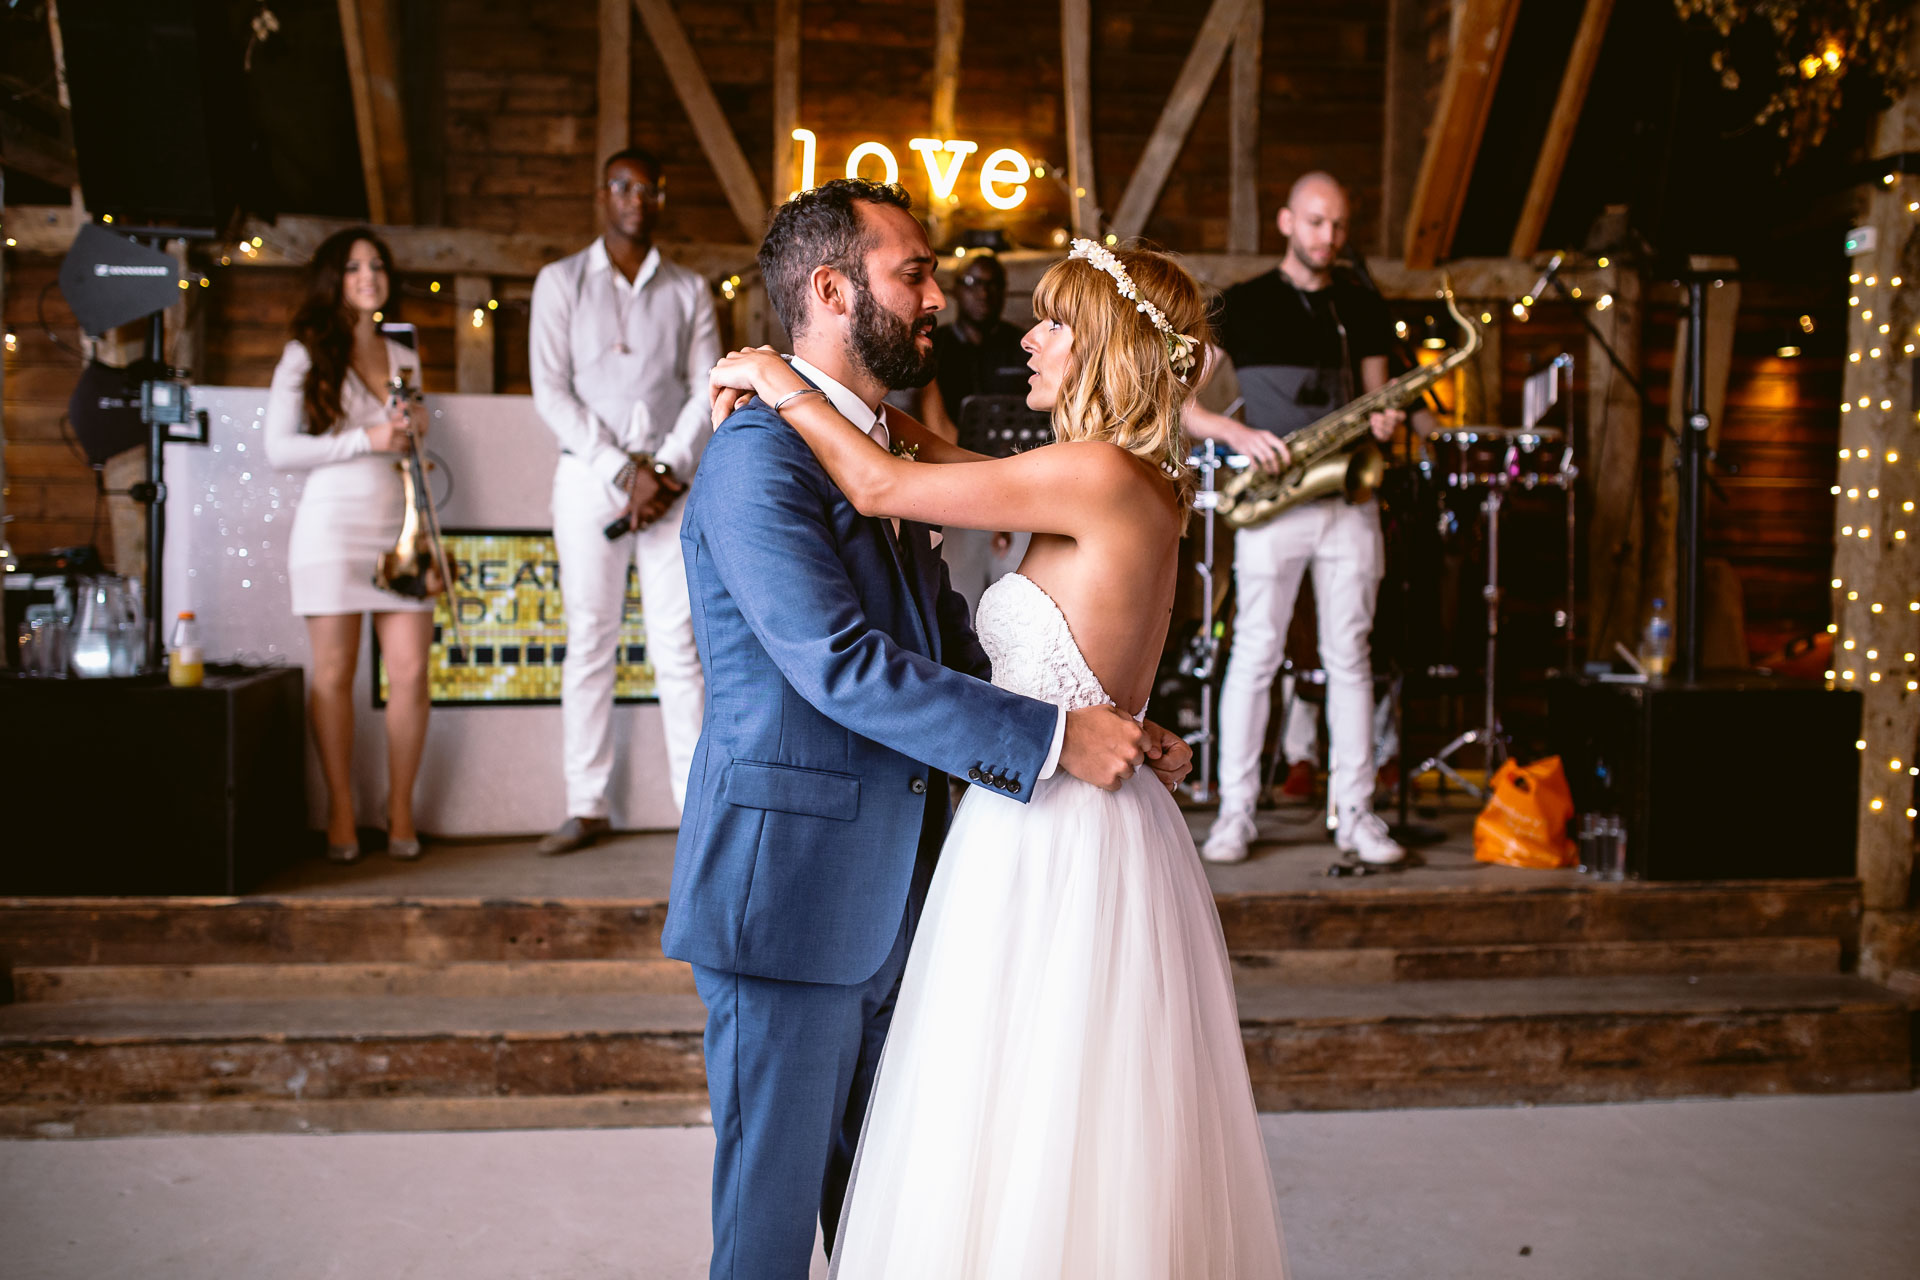 preston court boho wedding alexia and dan bride and groom first dance